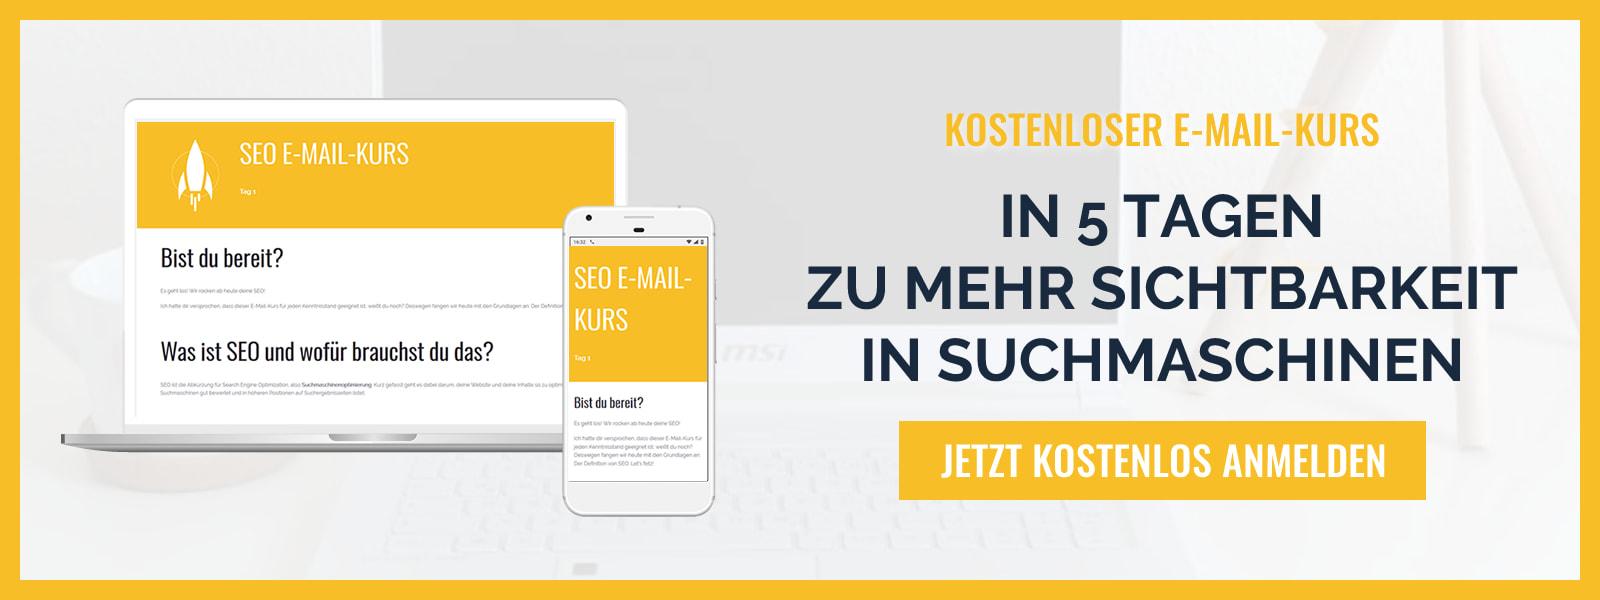 Steige frustfrei in SEO ein! Melde dich zum kostenlosen SEO E-Mail-Kurs an. | Blogger-Coaching.de